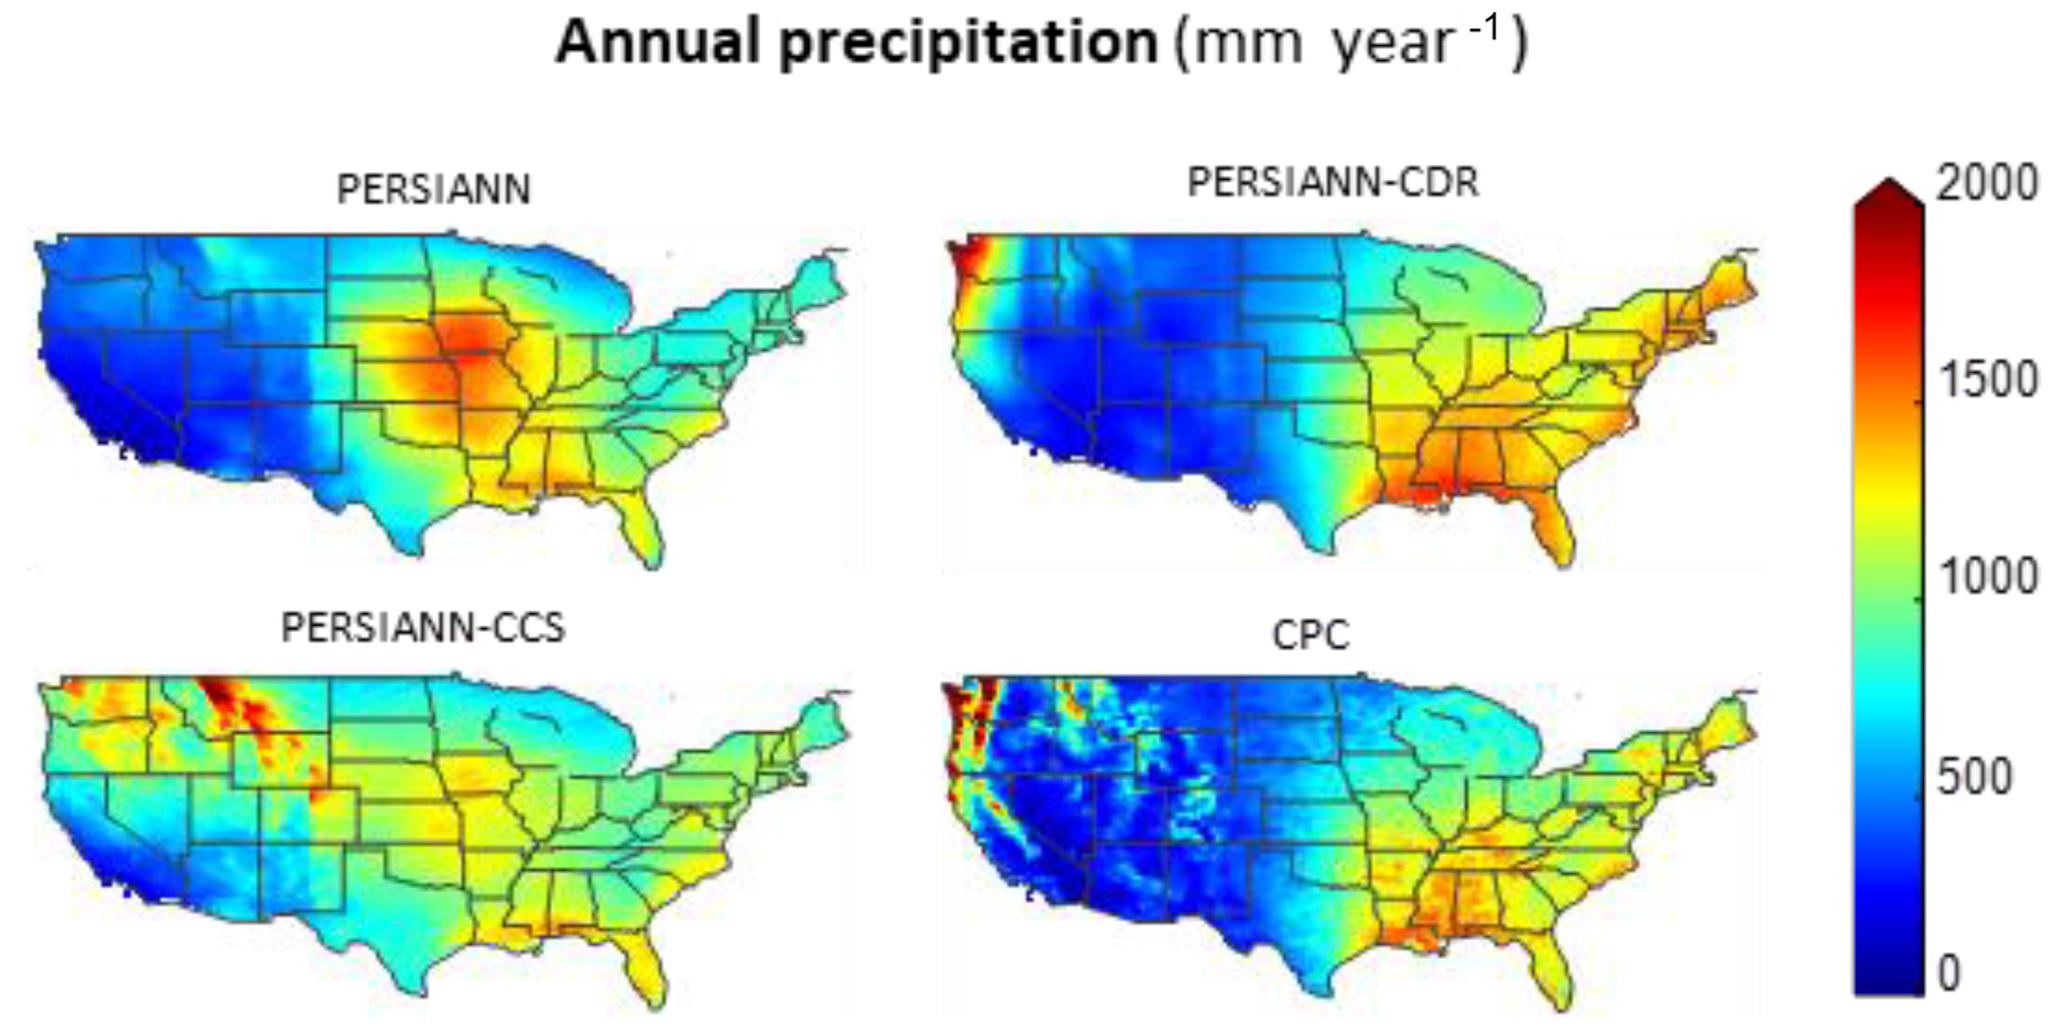 HESS - The PERSIANN family of global satellite precipitation data: a